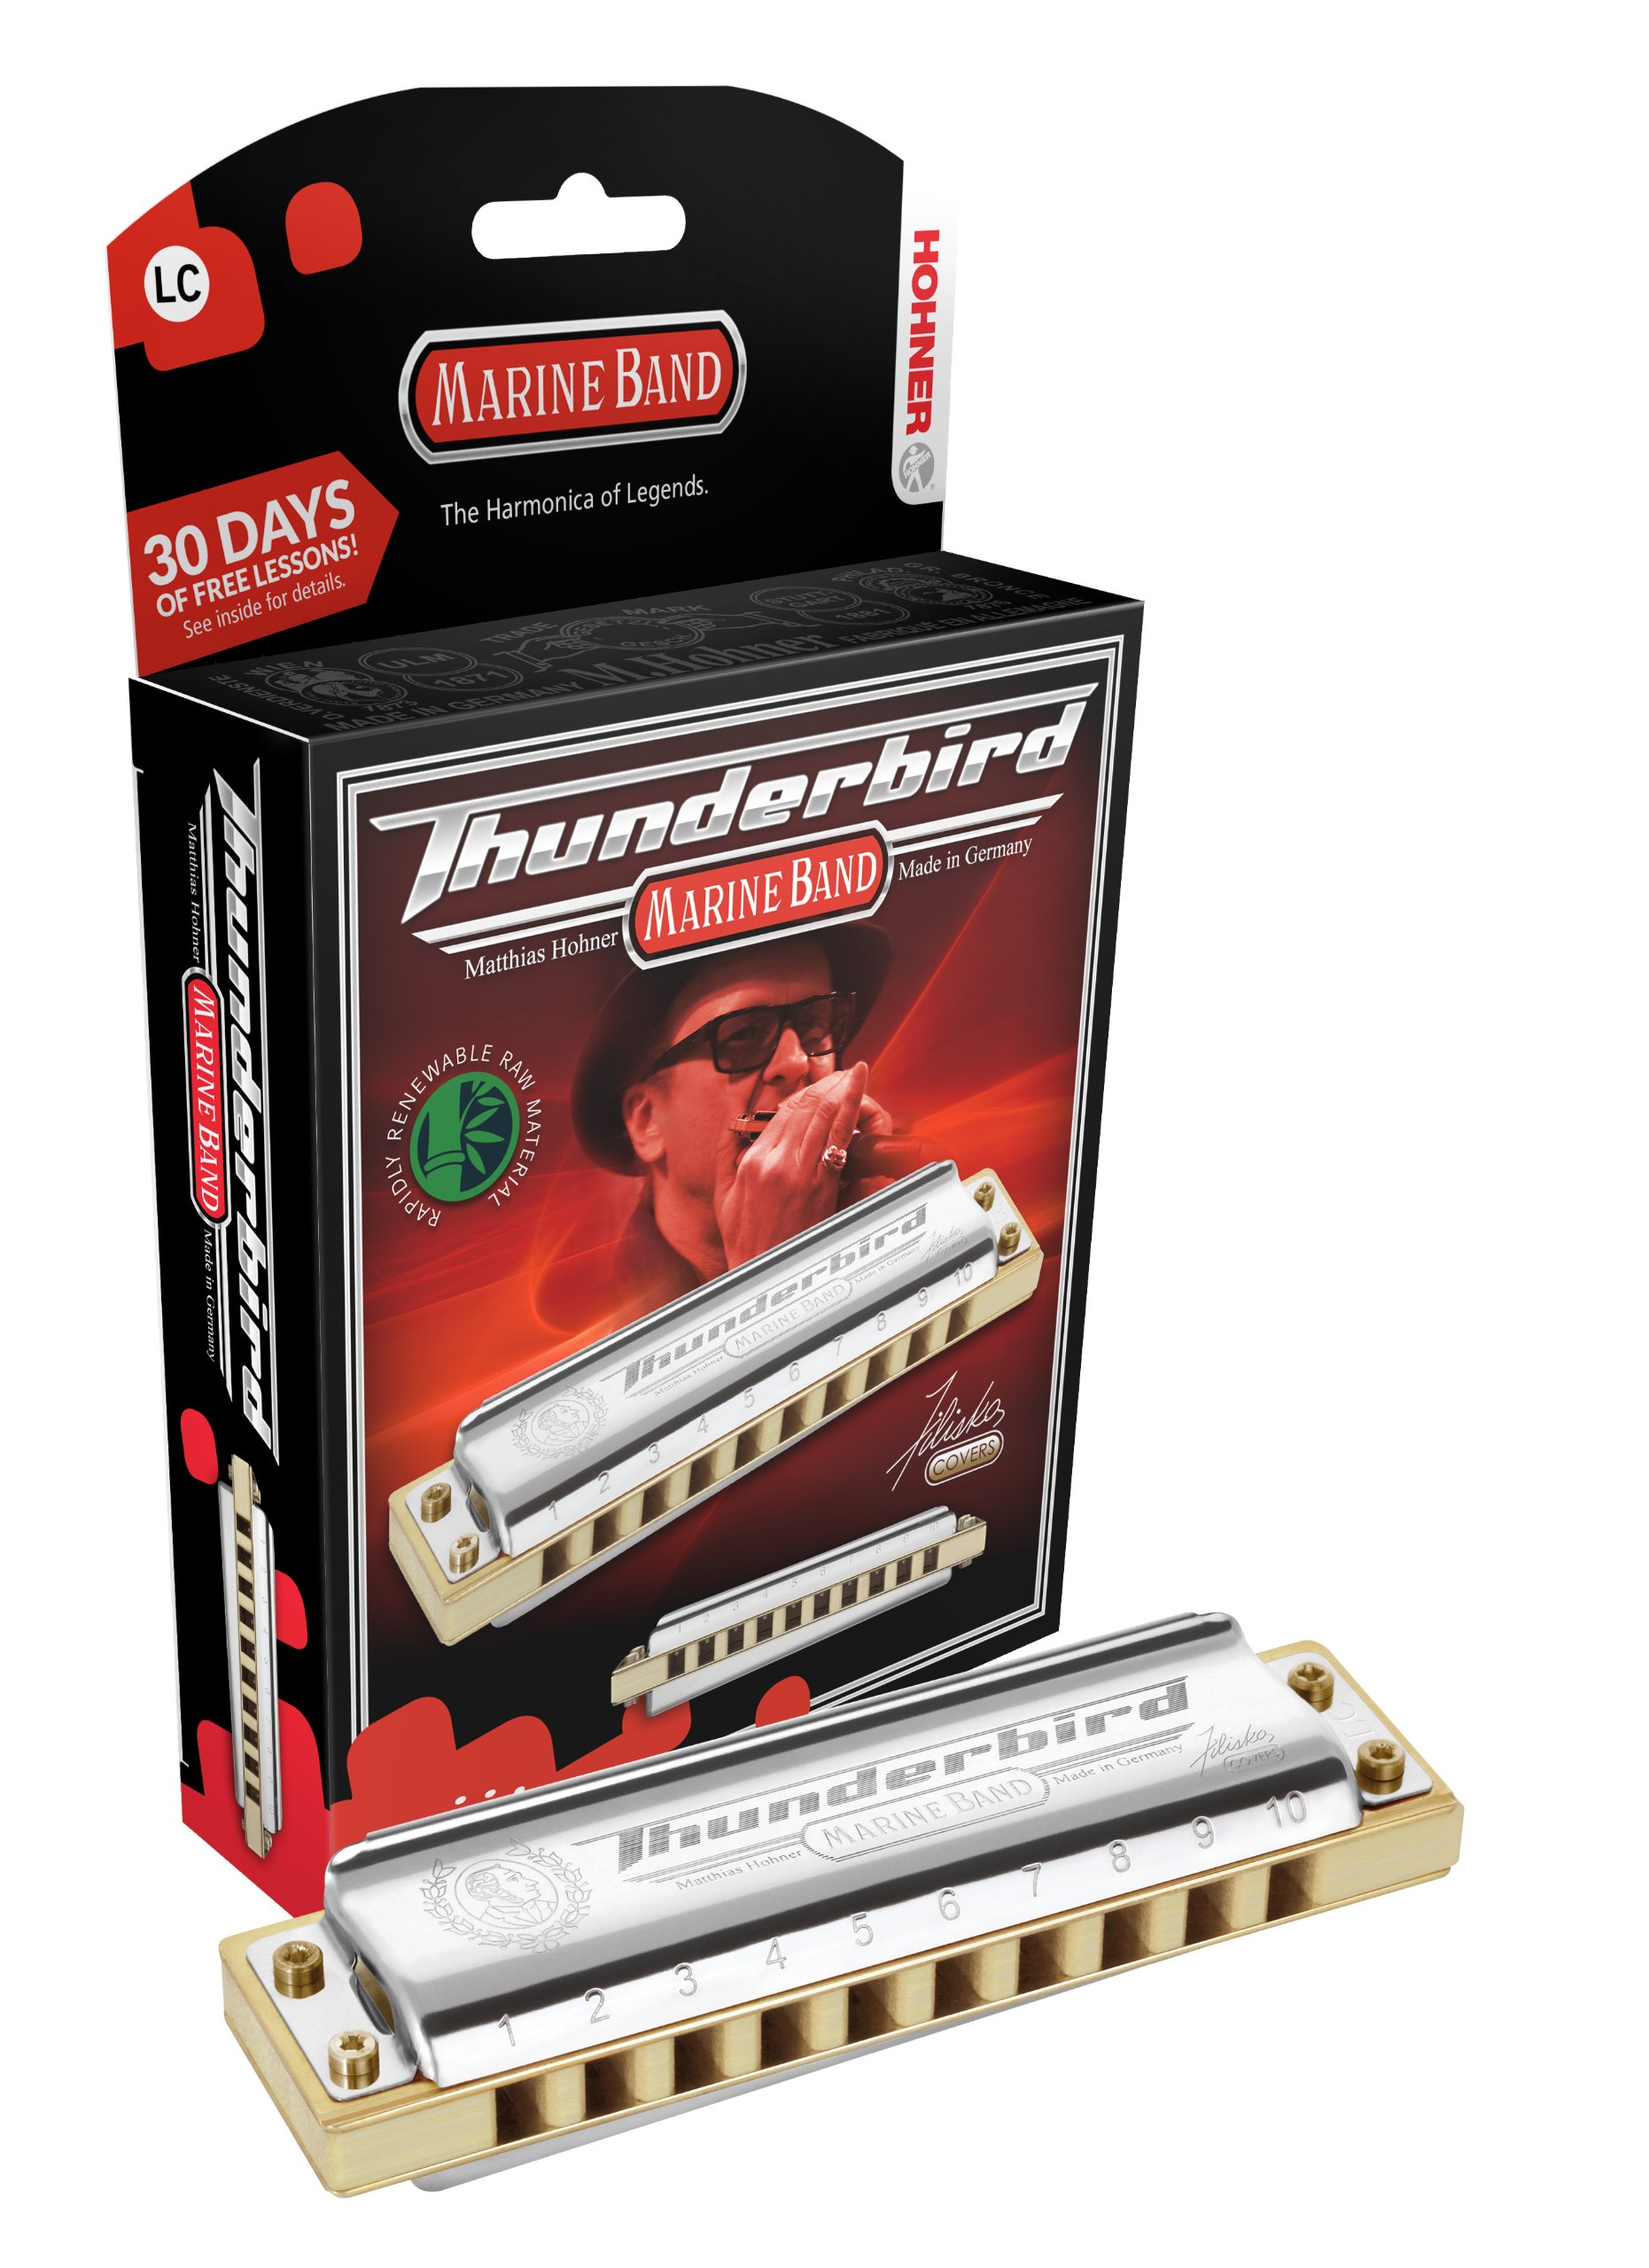 Hohner M2011BXL-F Marine Band Thunderbird Diatonic Harmonica, Key of Low F